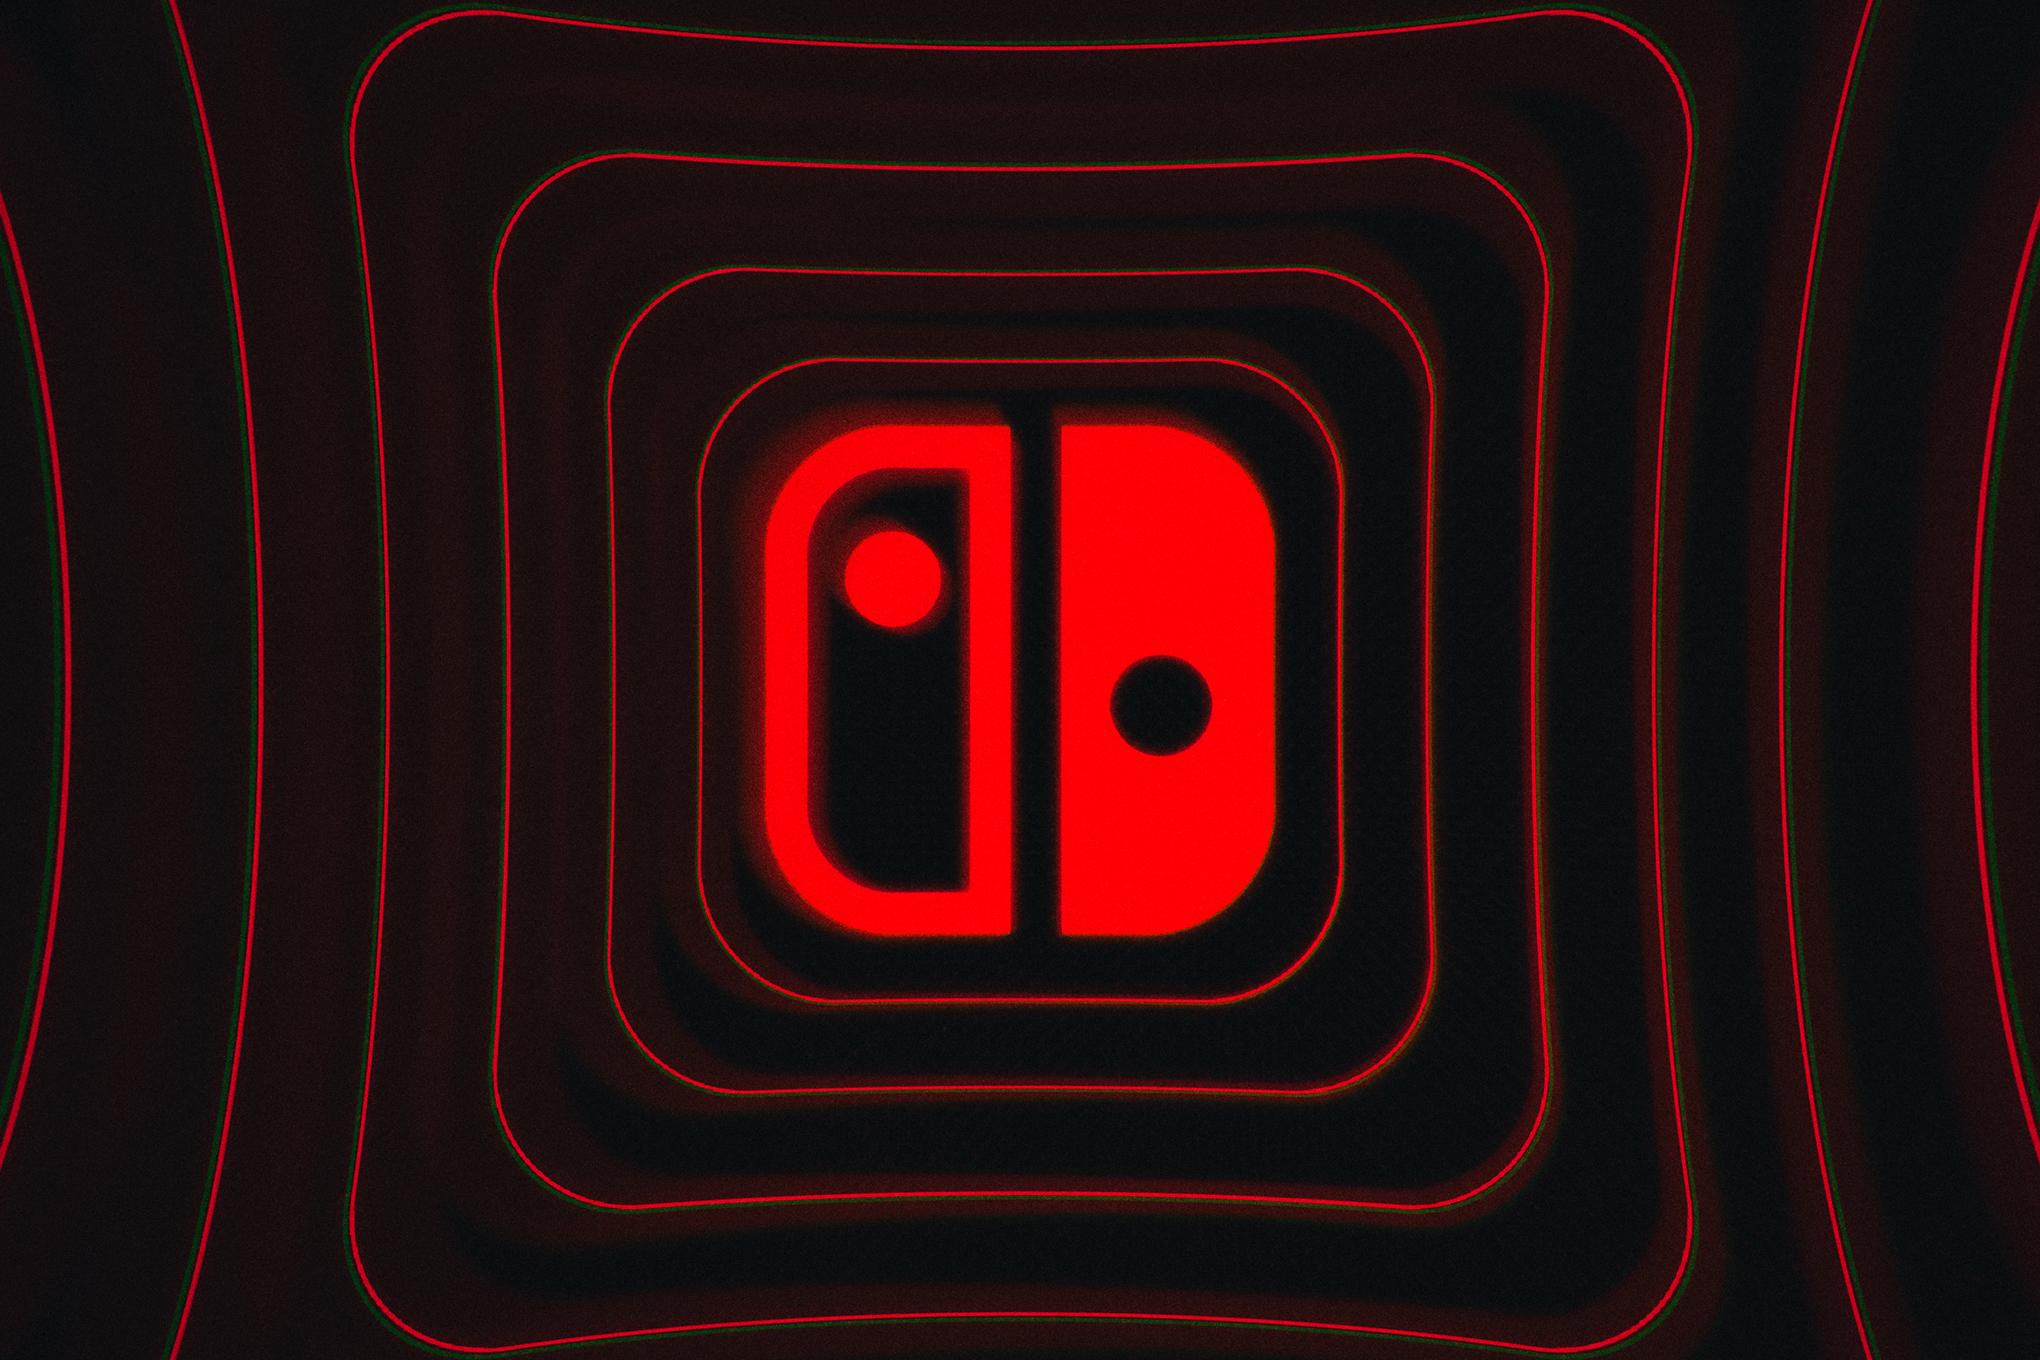 E3 2019 - The Verge